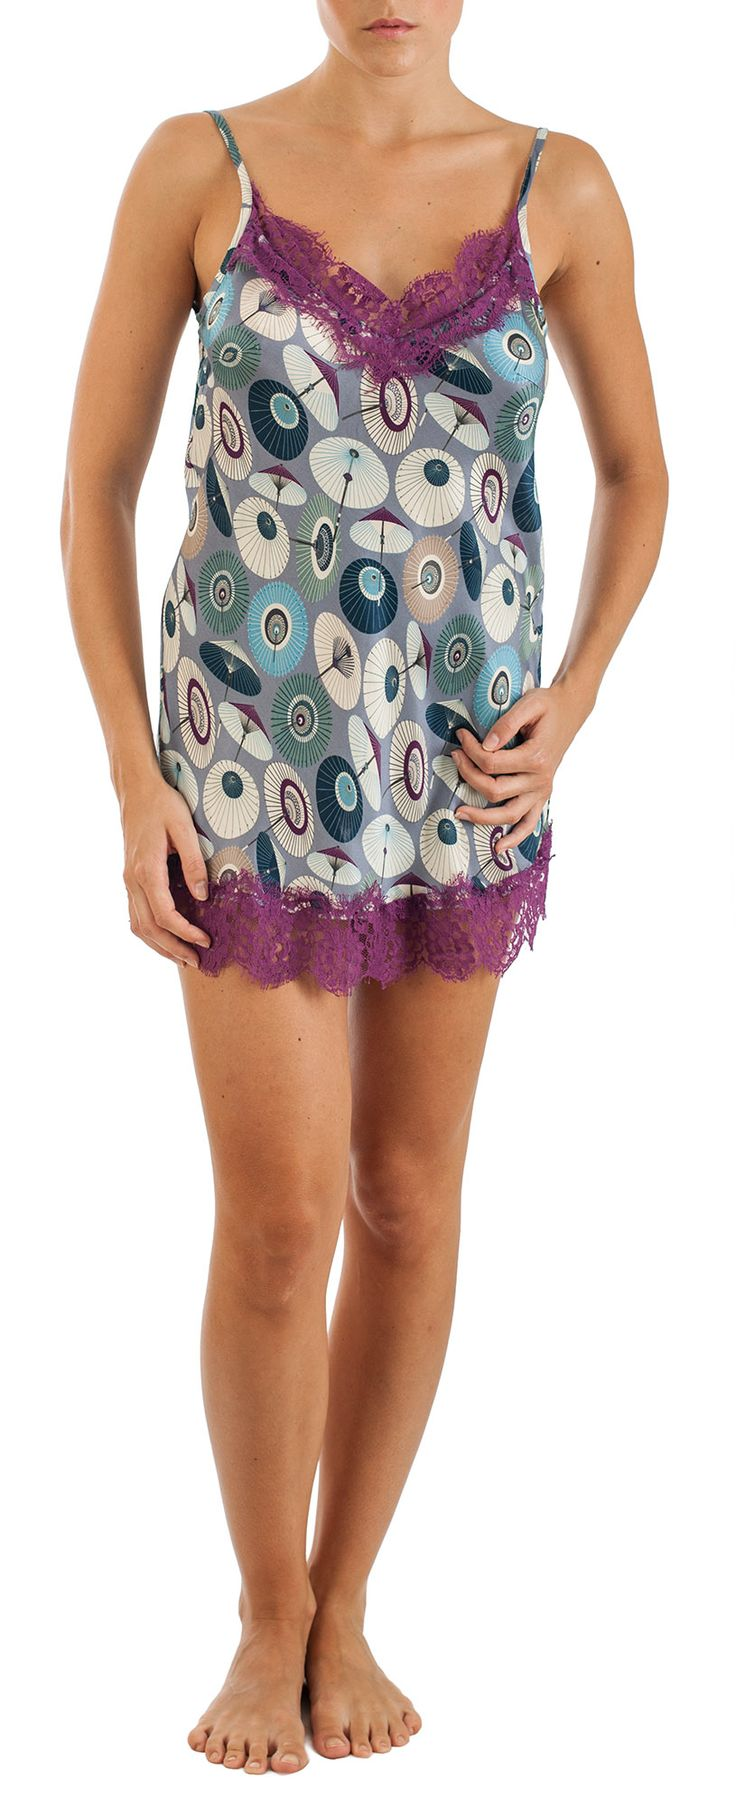 Lace-trimmed printed silk chemise camisole with japanese umbrellas print, adjustable shoulder straps. Composition: 30% silk; 70% viscose http://grazialliani-shop.com/en/sottoveste-parigina-seta-2 #Chemise #BabyDoll #Sleepwear #sottovesti #outwear #miniabiti #Grazialliani #Loungewear